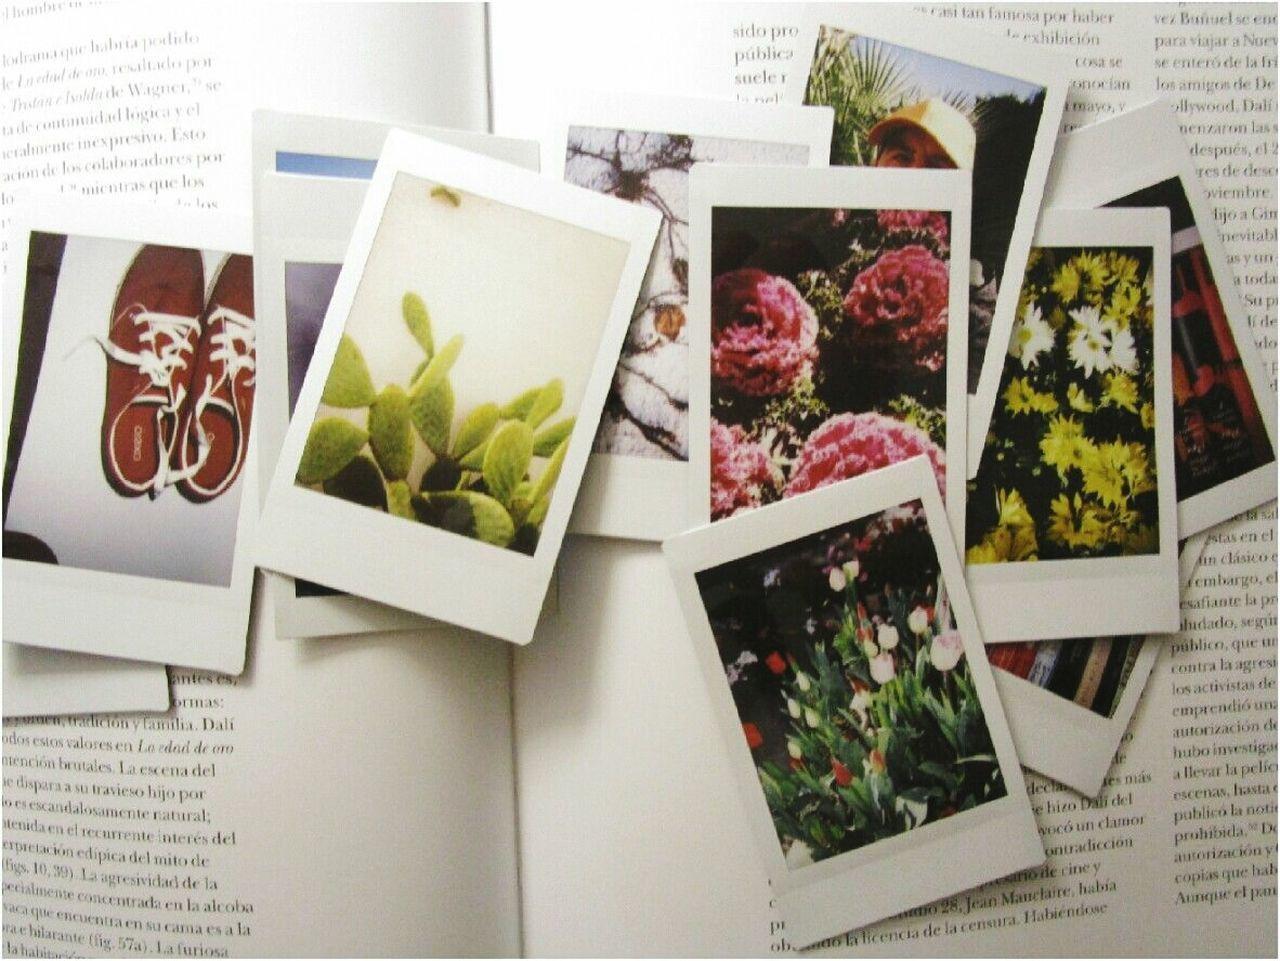 my mini instant photos MyArt Instantphoto Plant Instapic Indoors  Memories No People